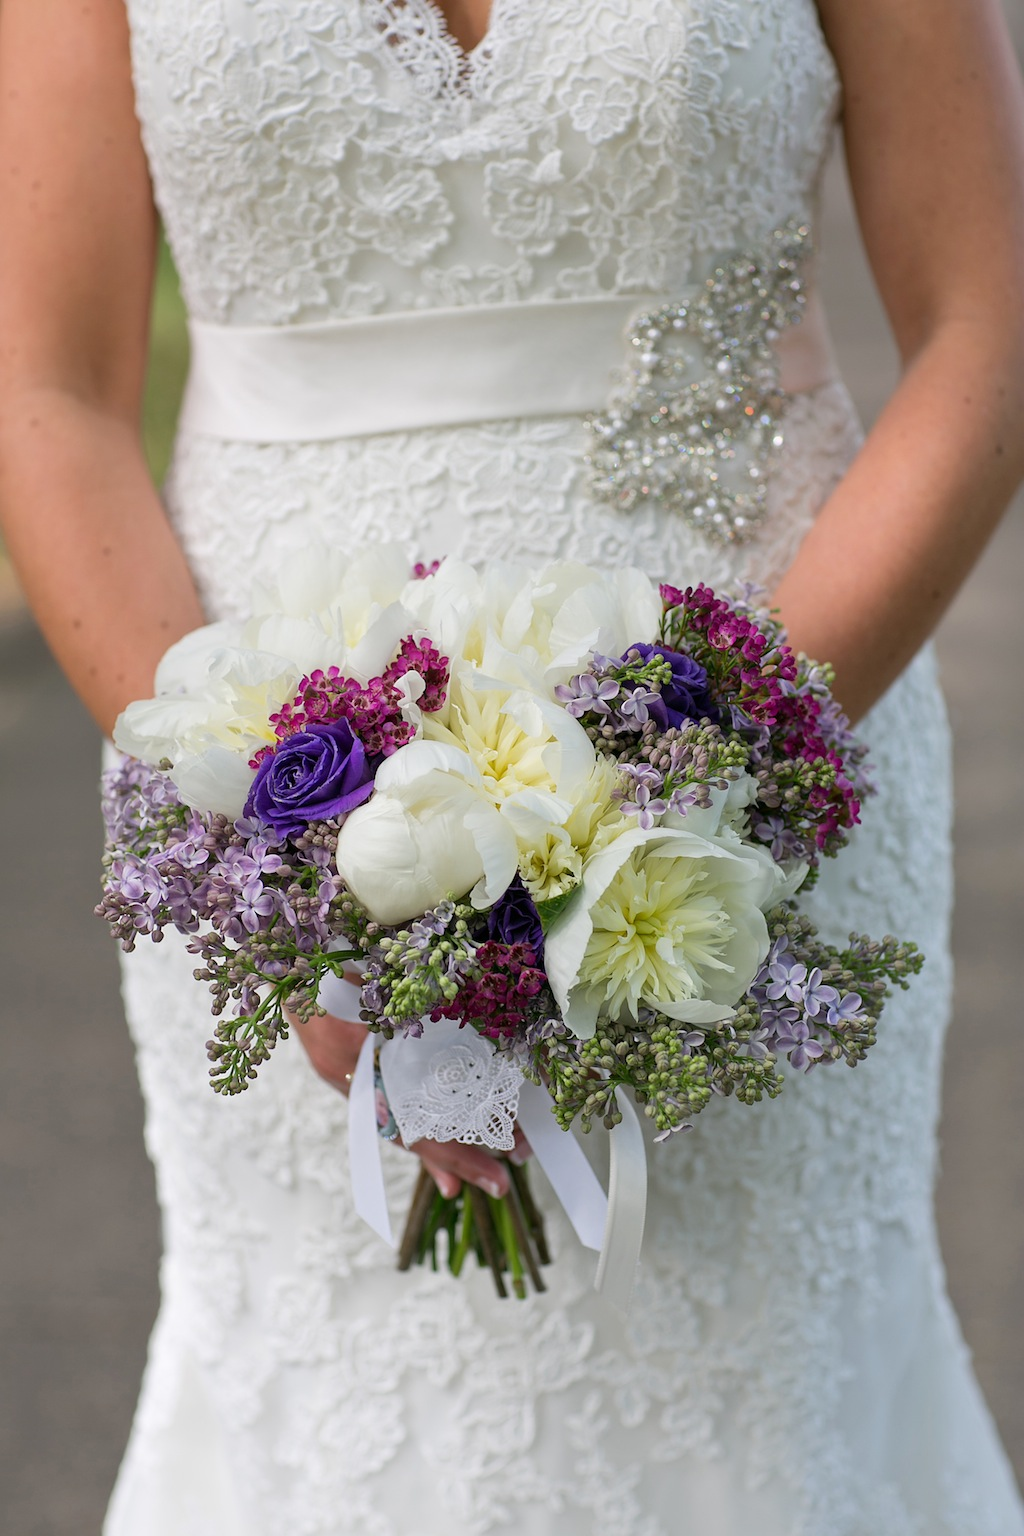 Downtown St. Pete Wedding - Birchwood Wedding - North Straub Park Wedding - Jenn Hopkins Photography (17)